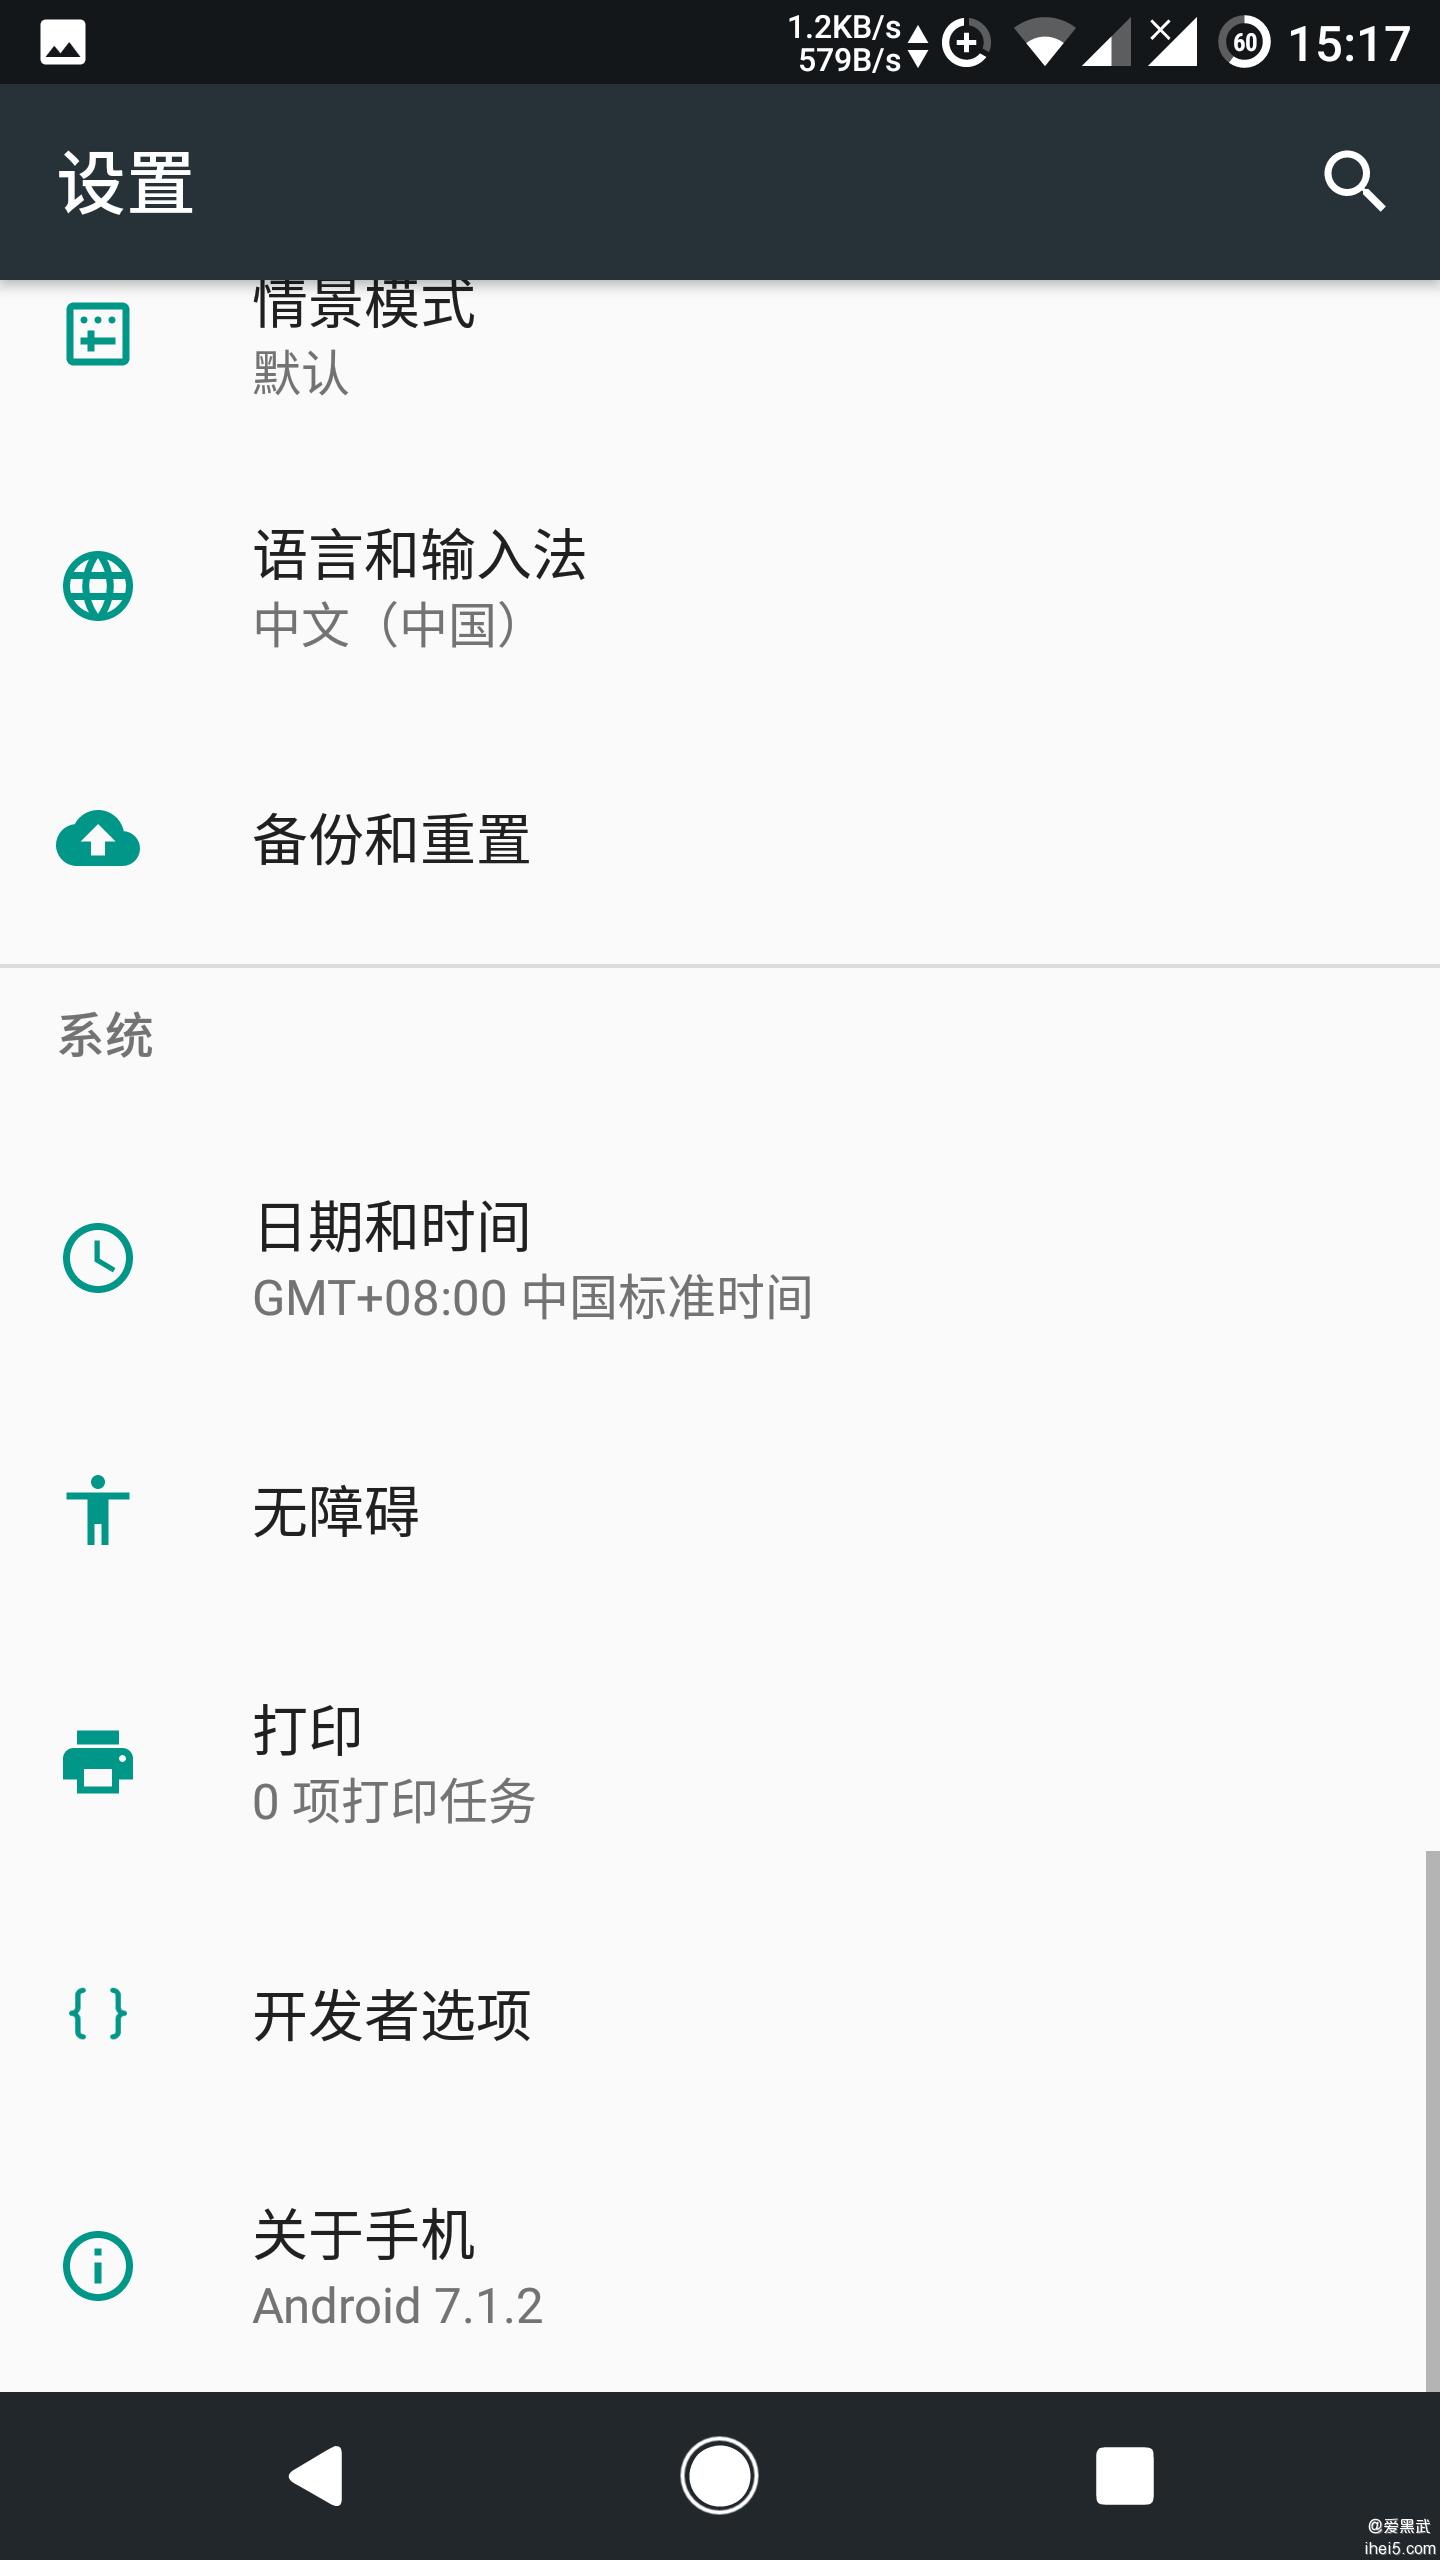 Screenshot_20170605-151735.png